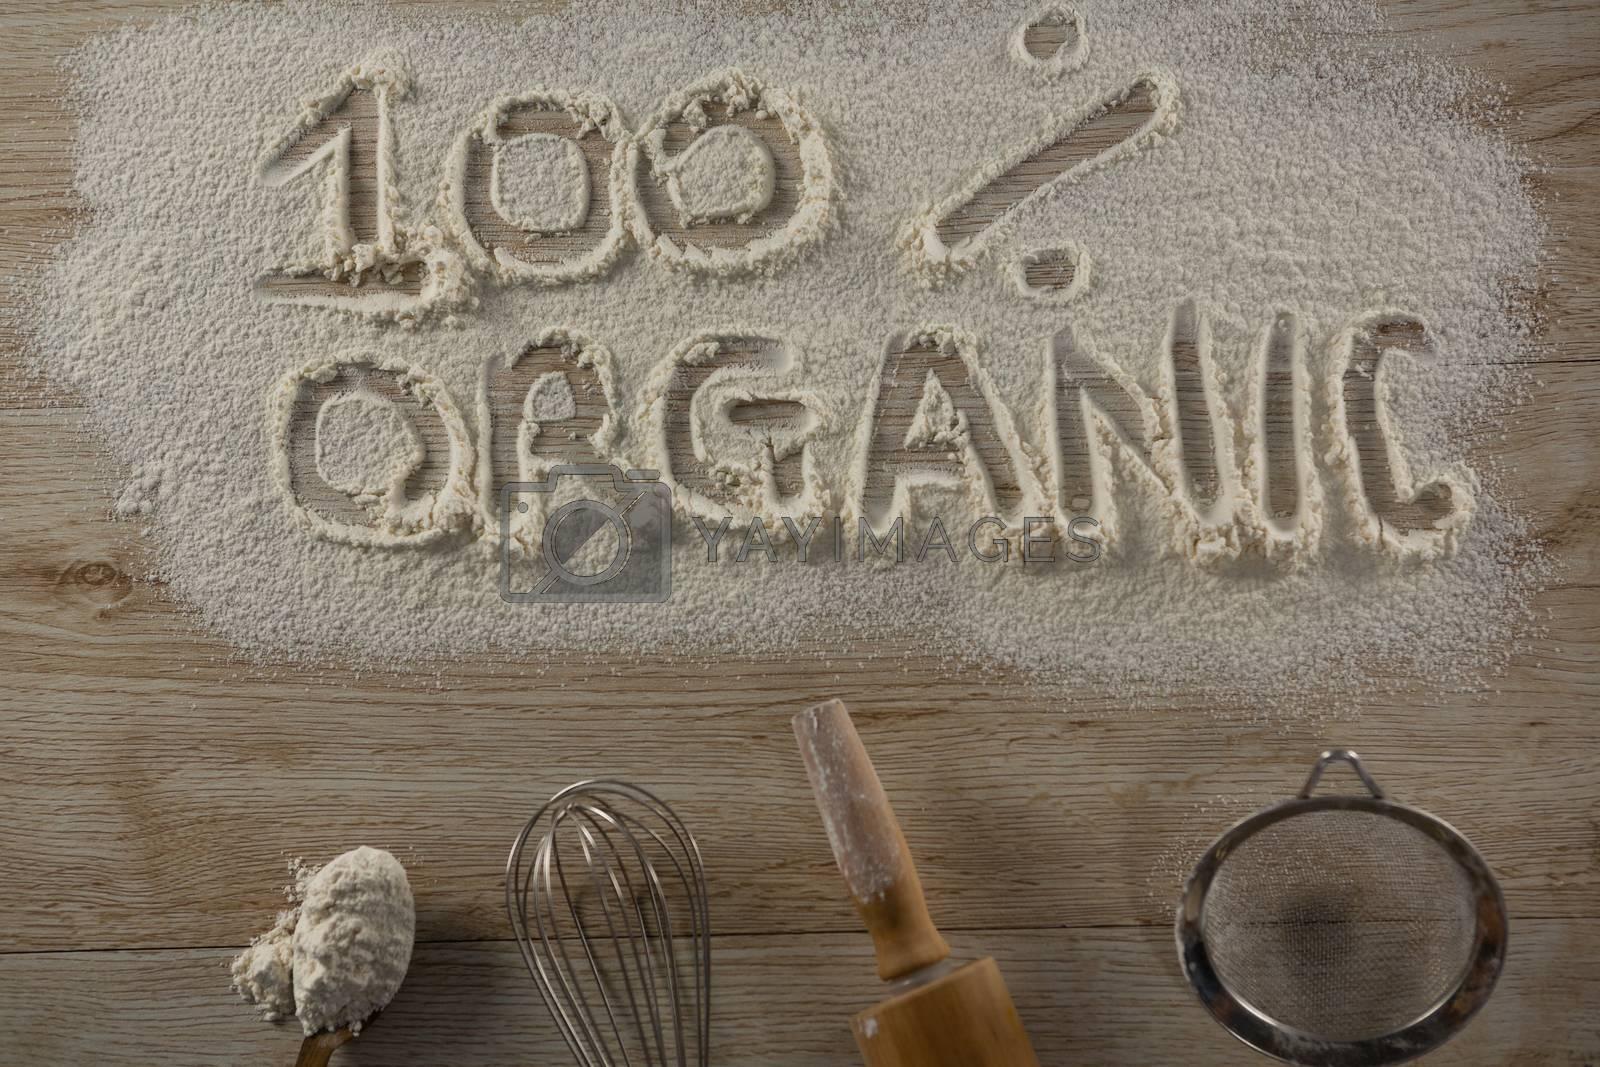 The word 100 percent organic written on sprinkled flour by Wavebreakmedia